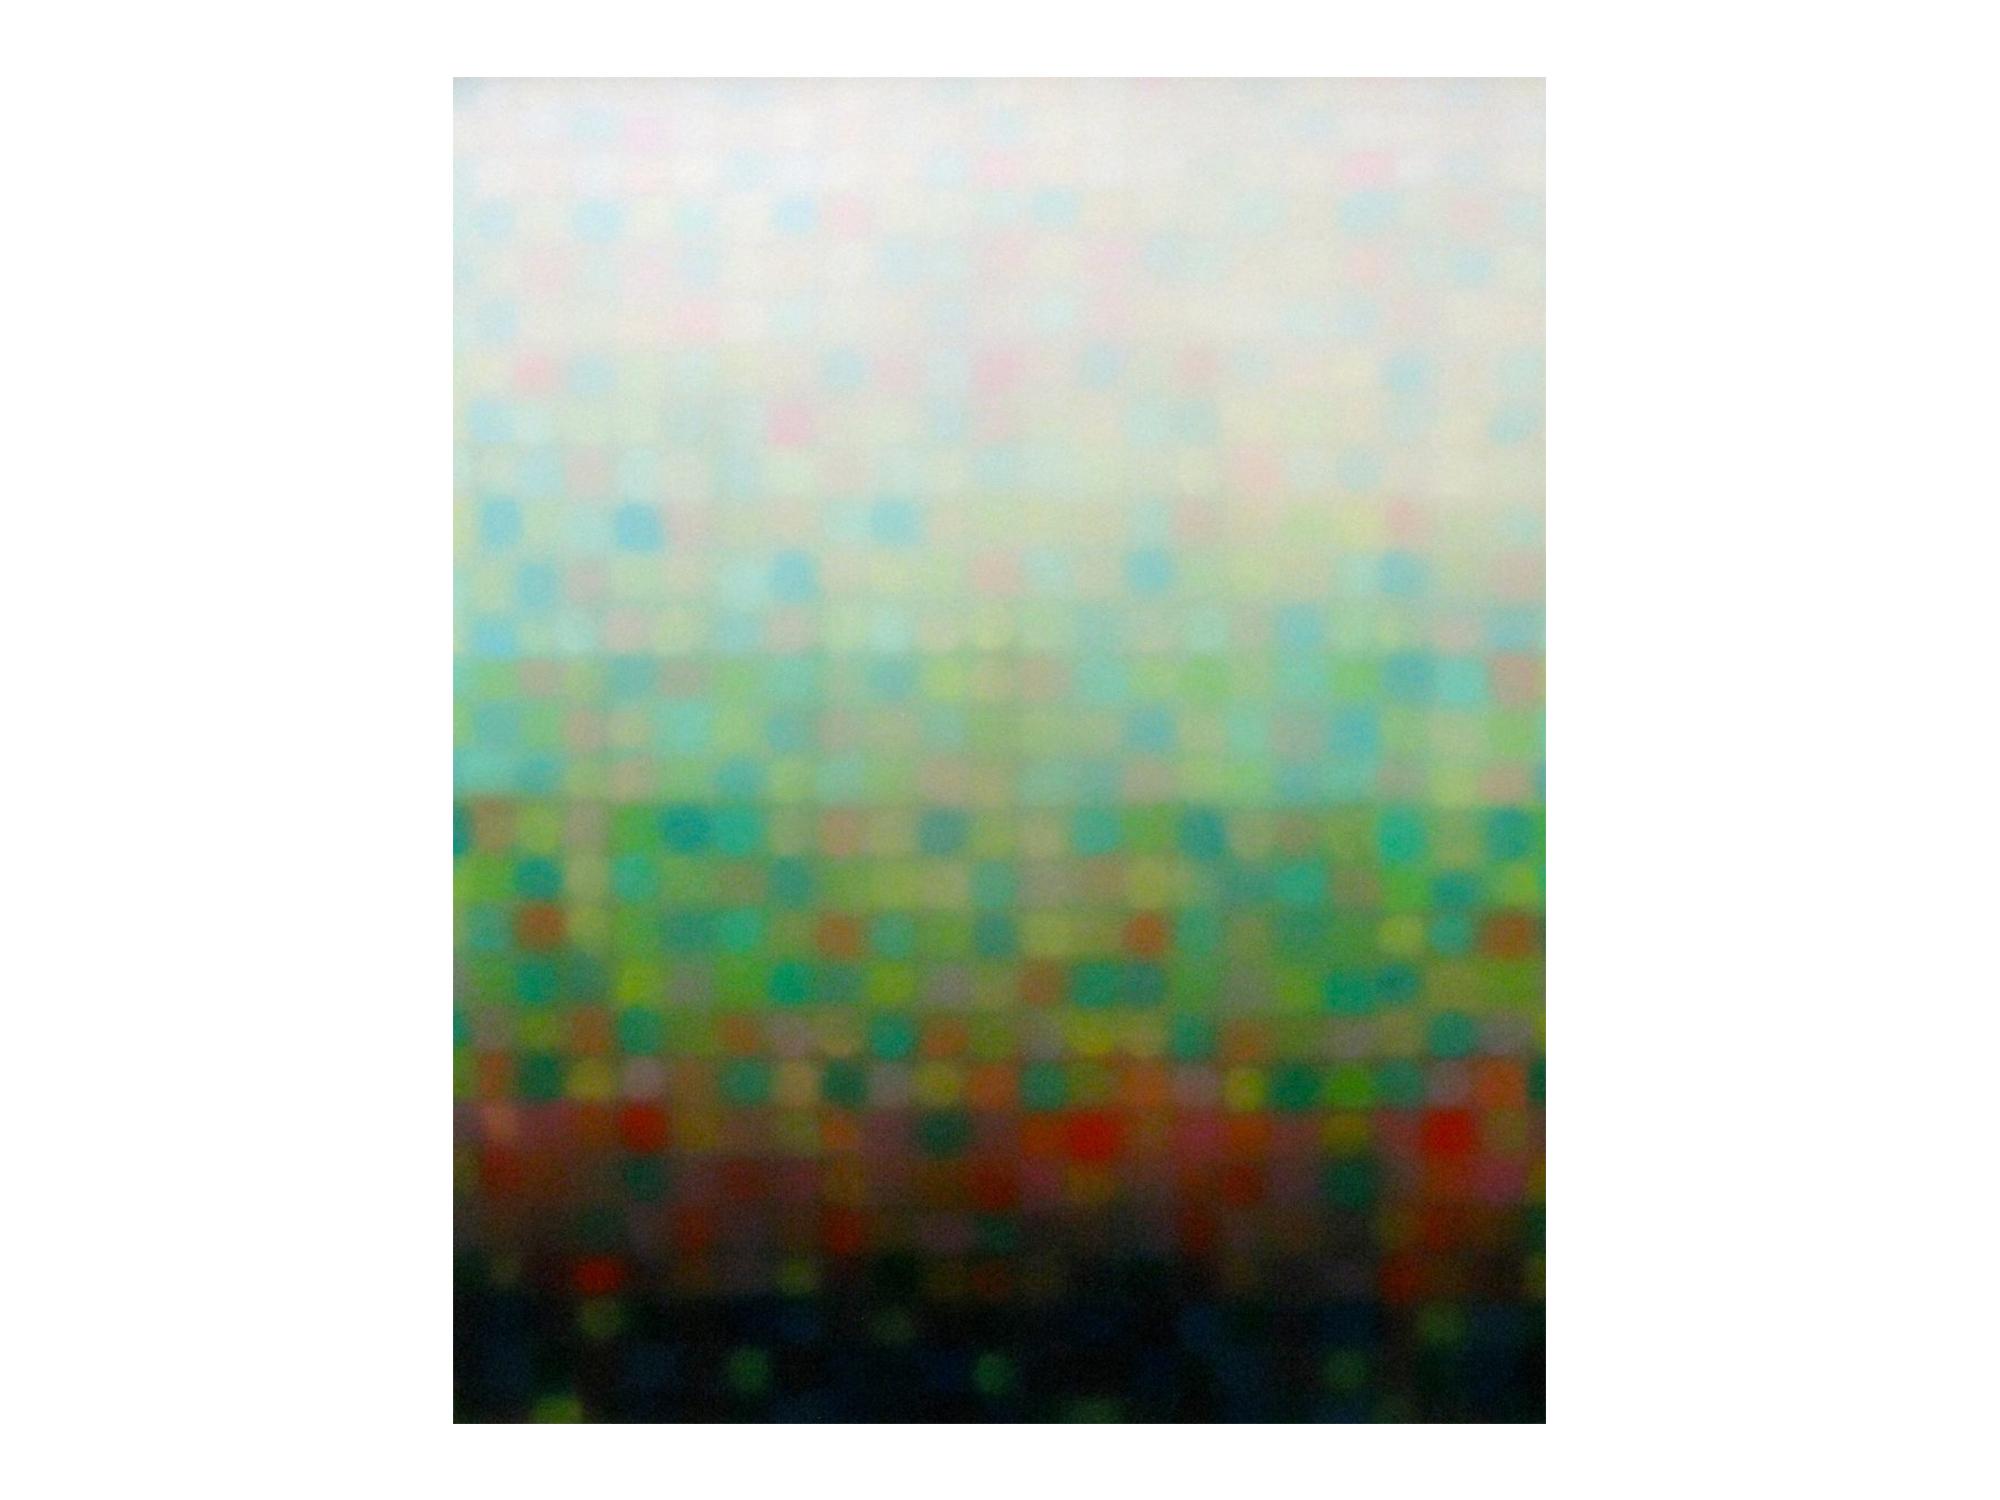 Matthew Johnson    Light Verdant , 2014 oil on linen 110 x 90cm   ARTIST BIO